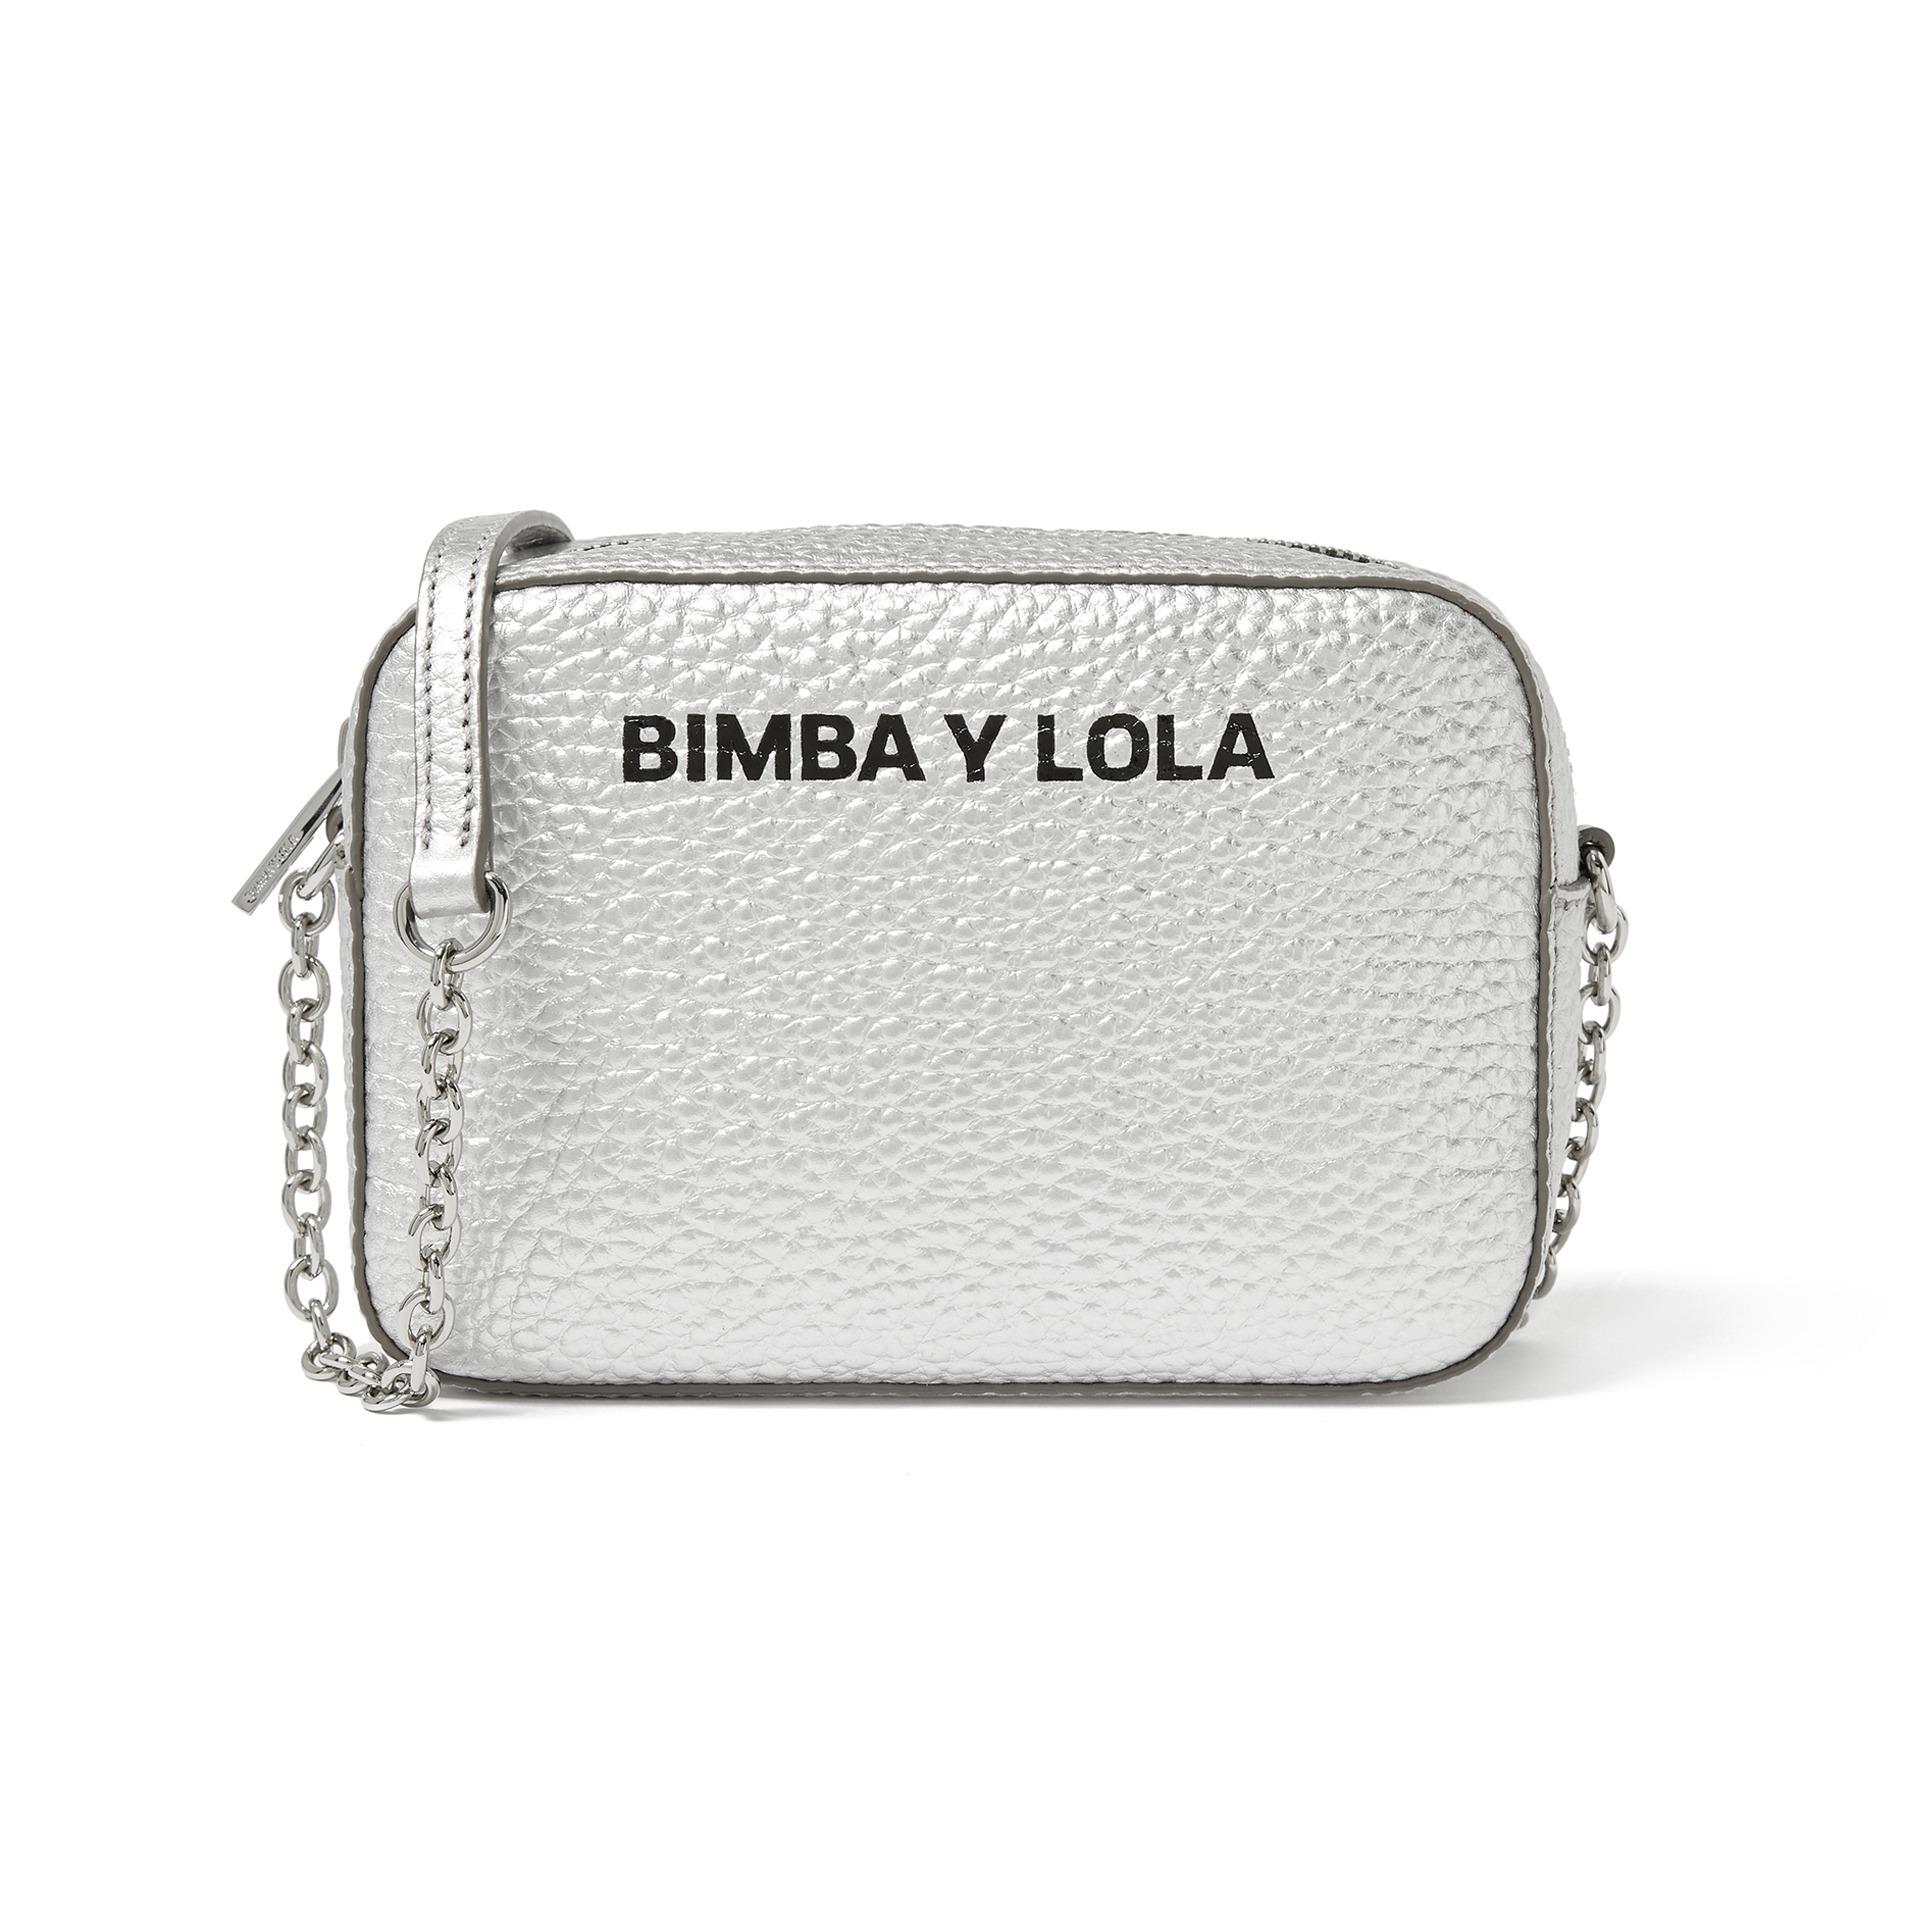 Bimba y Lola outlet